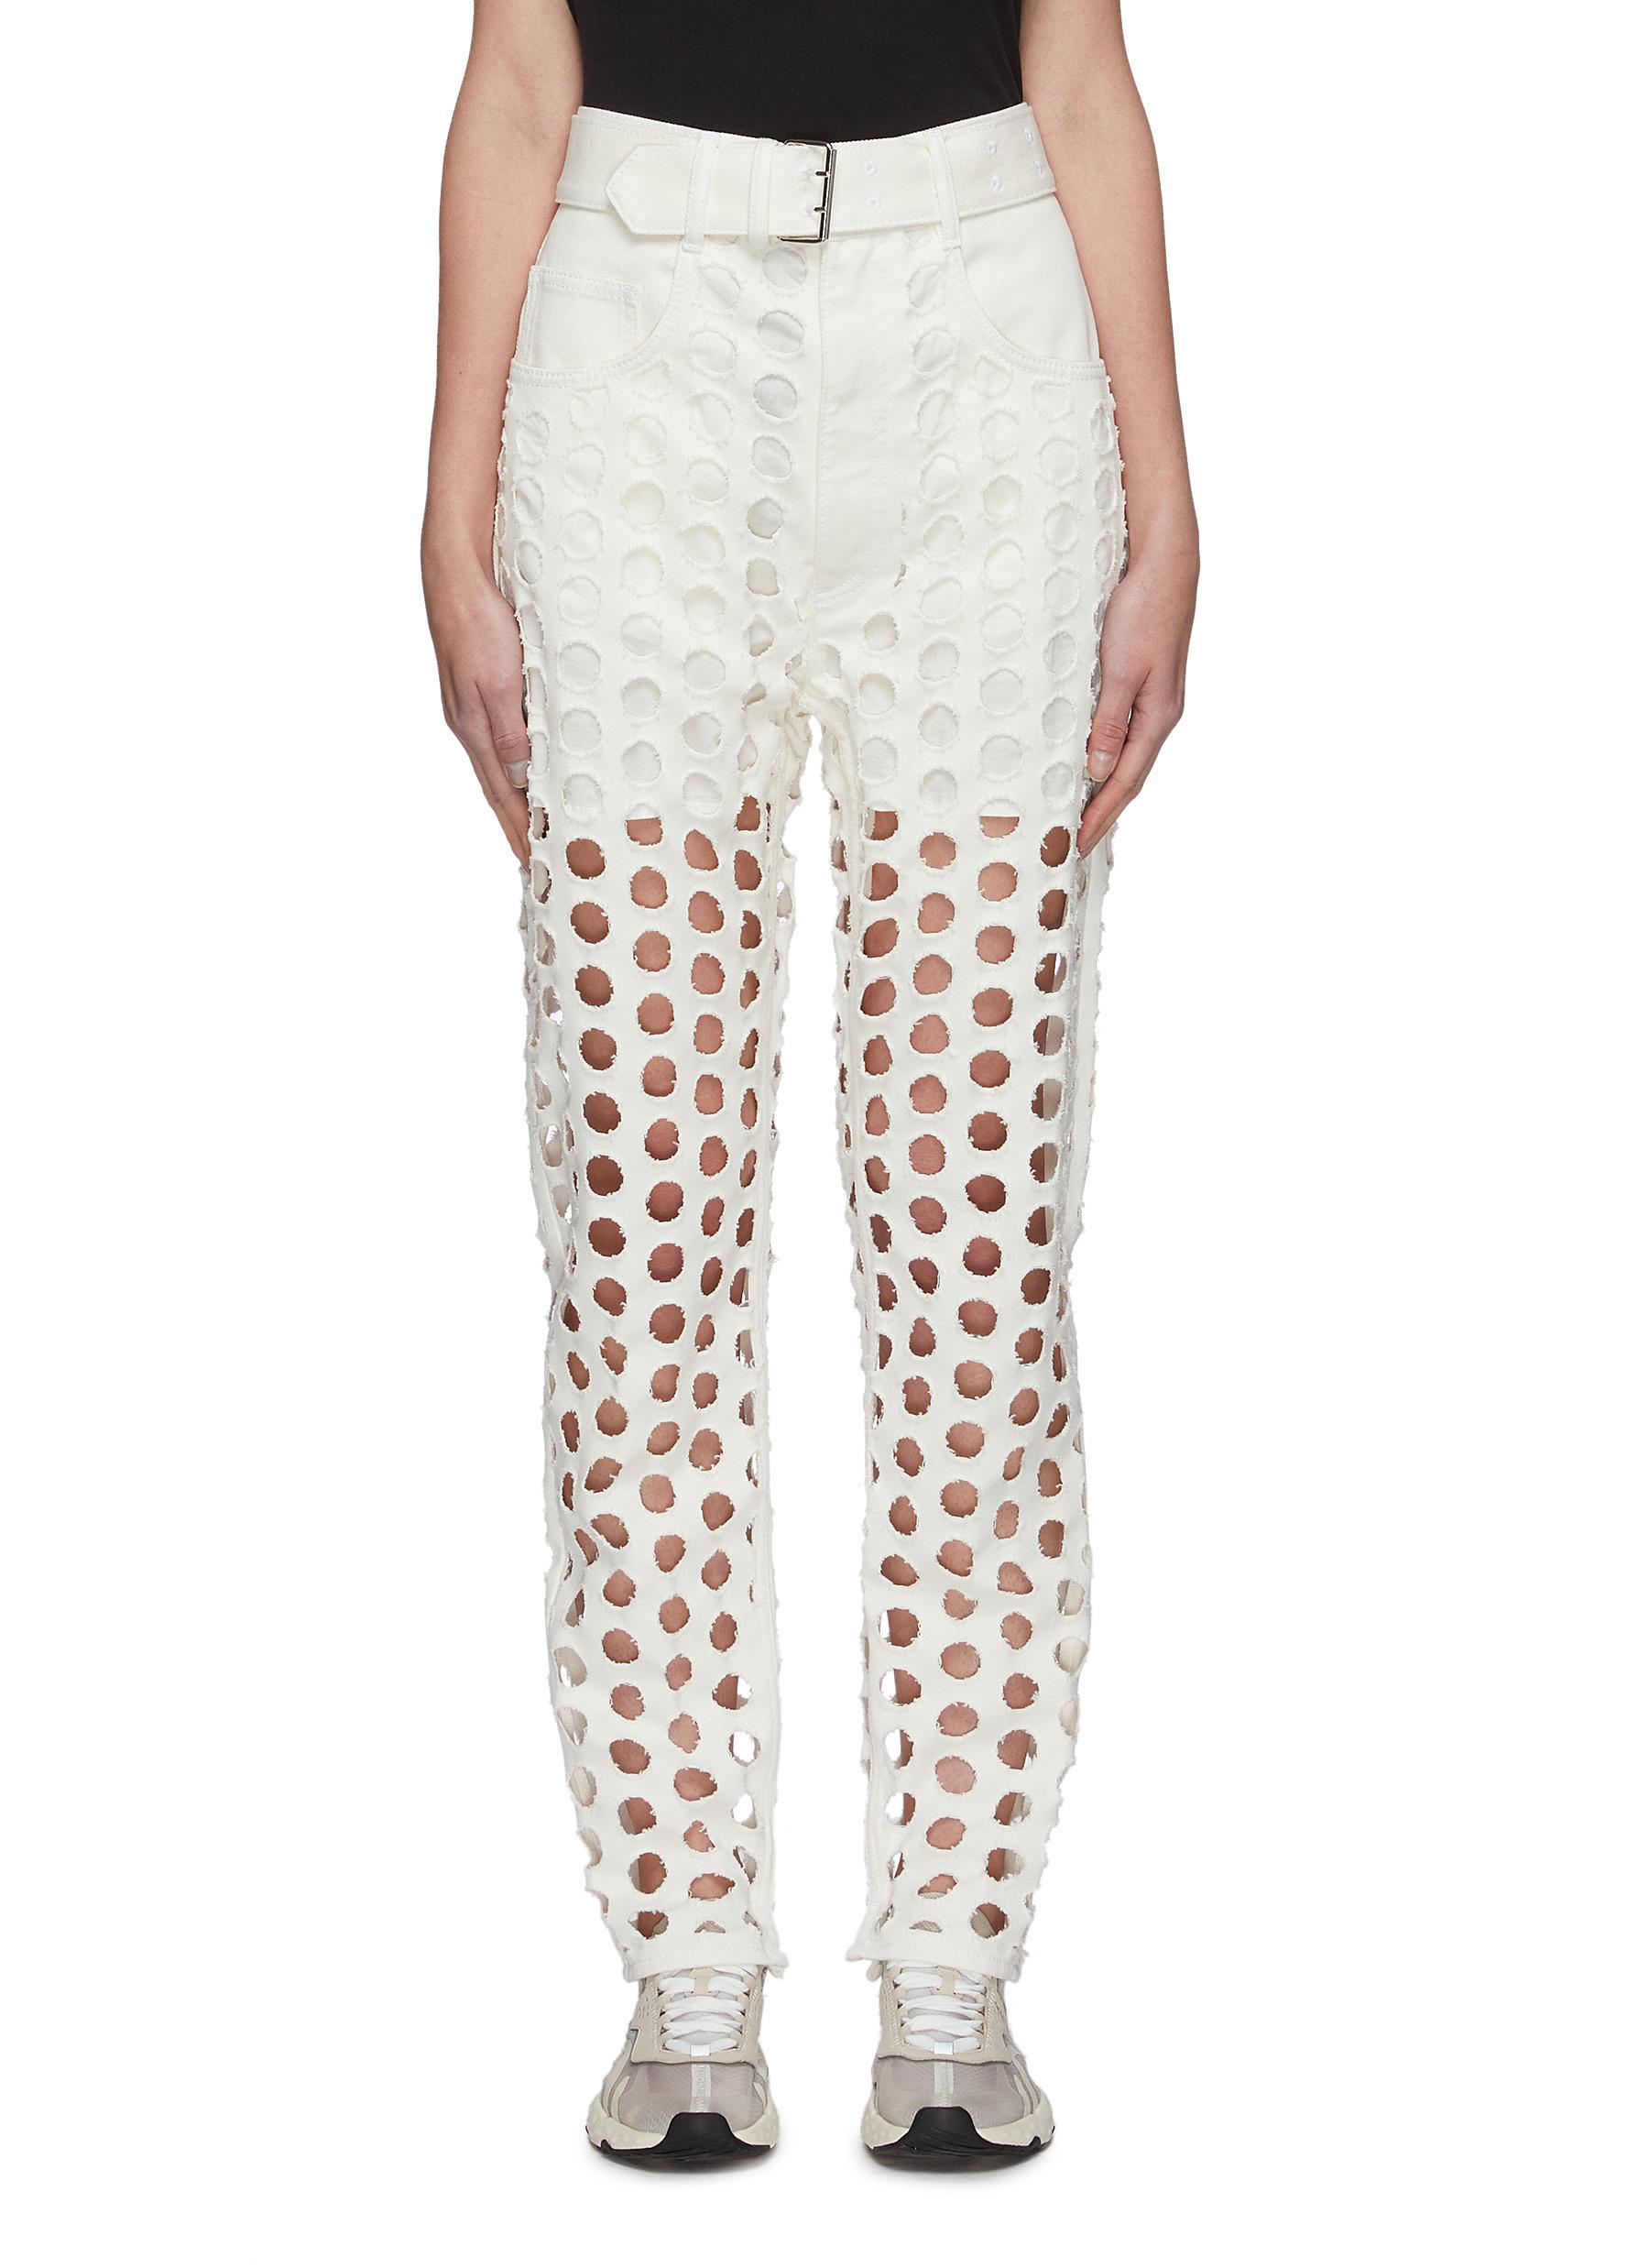 Buy Maison Margiela Jeans Laser cut polka dot belted jeans